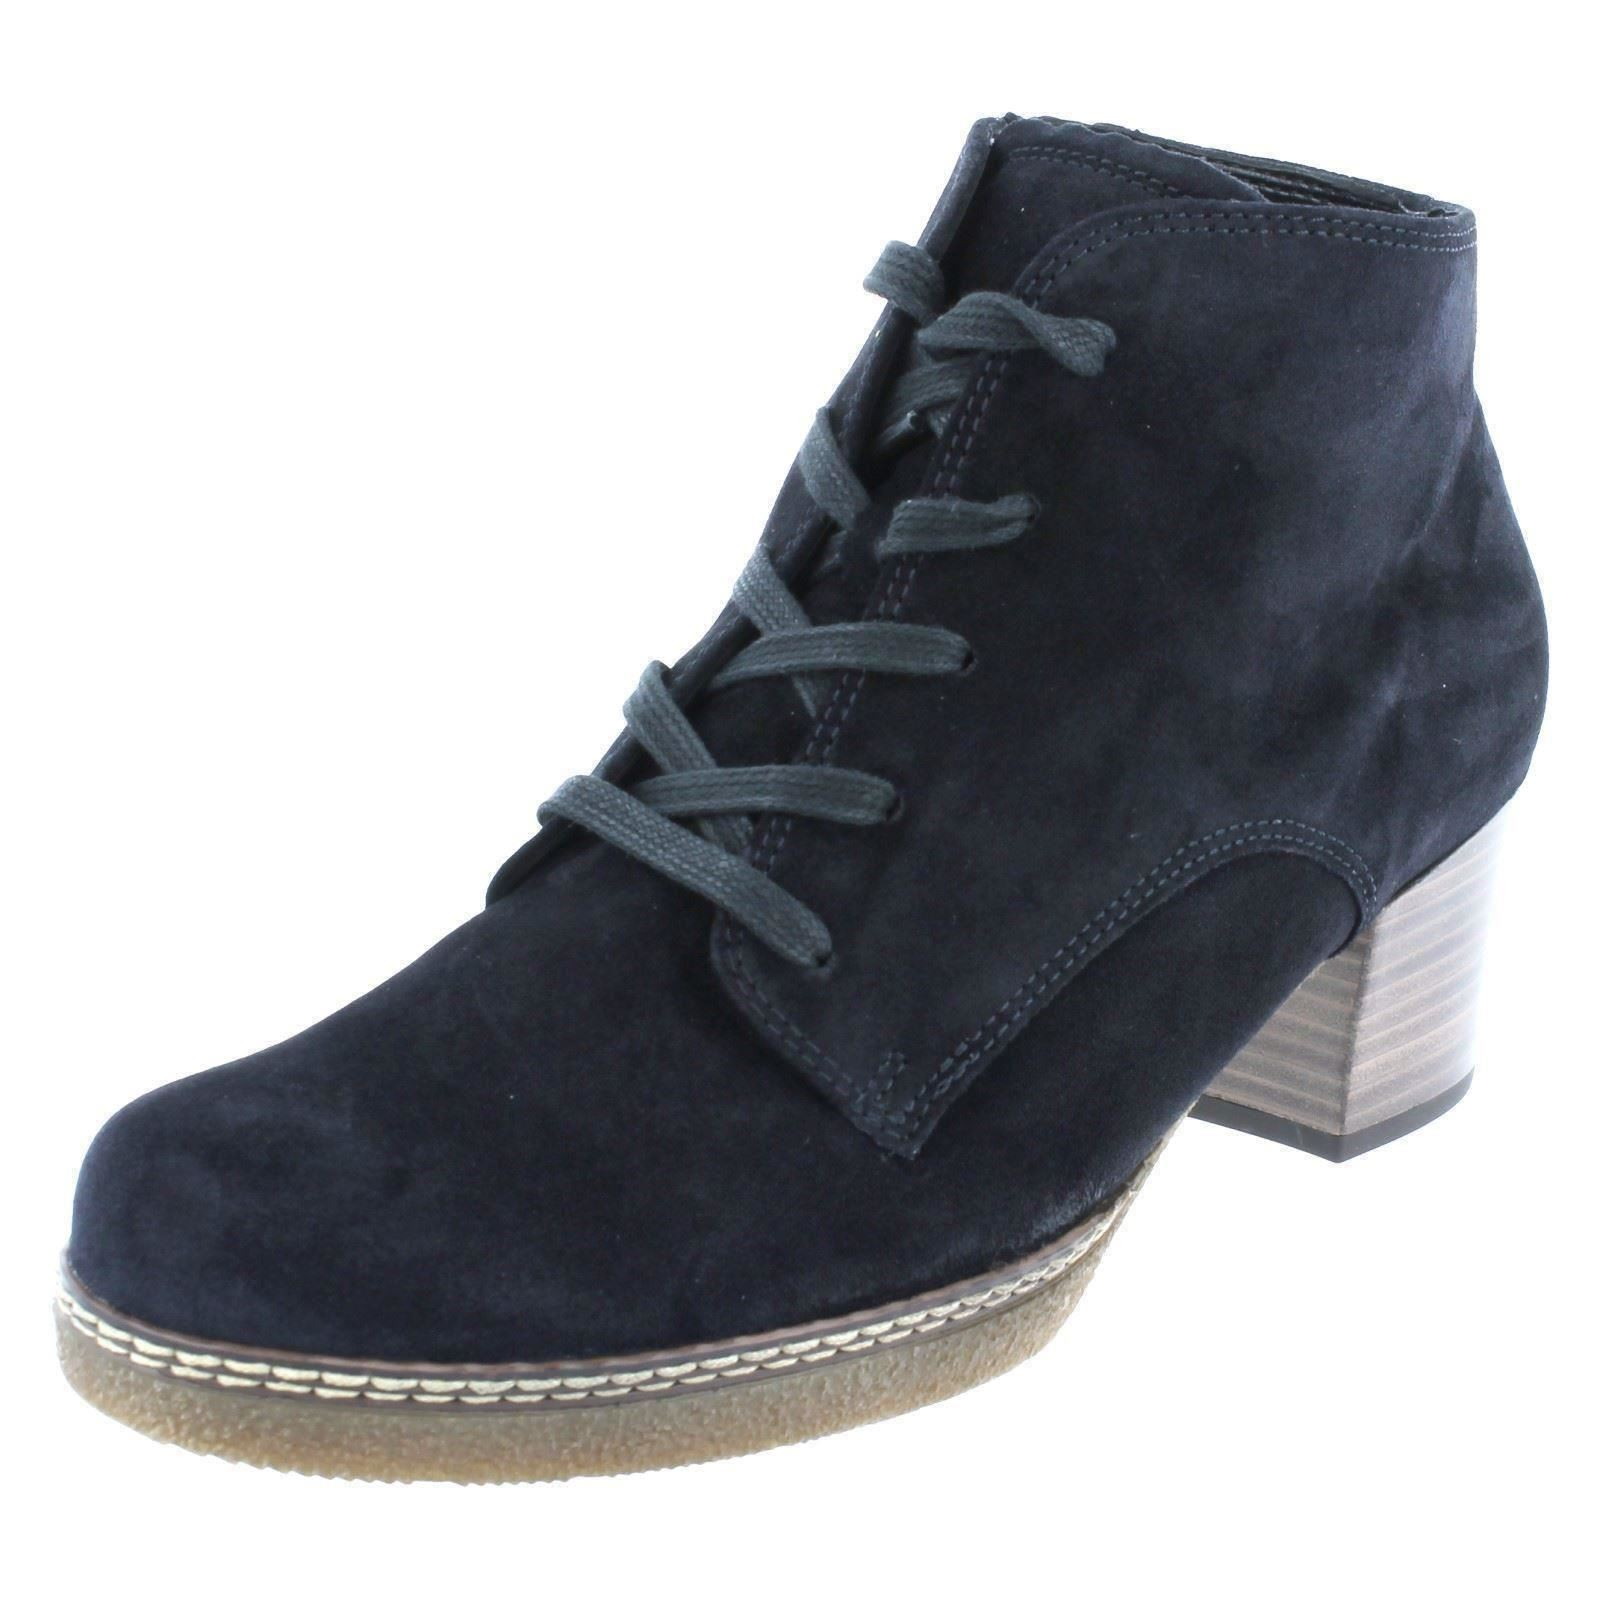 eb4b11638cf70b Gabor-Ladies-Ankle-Boots-96660 thumbnail 2